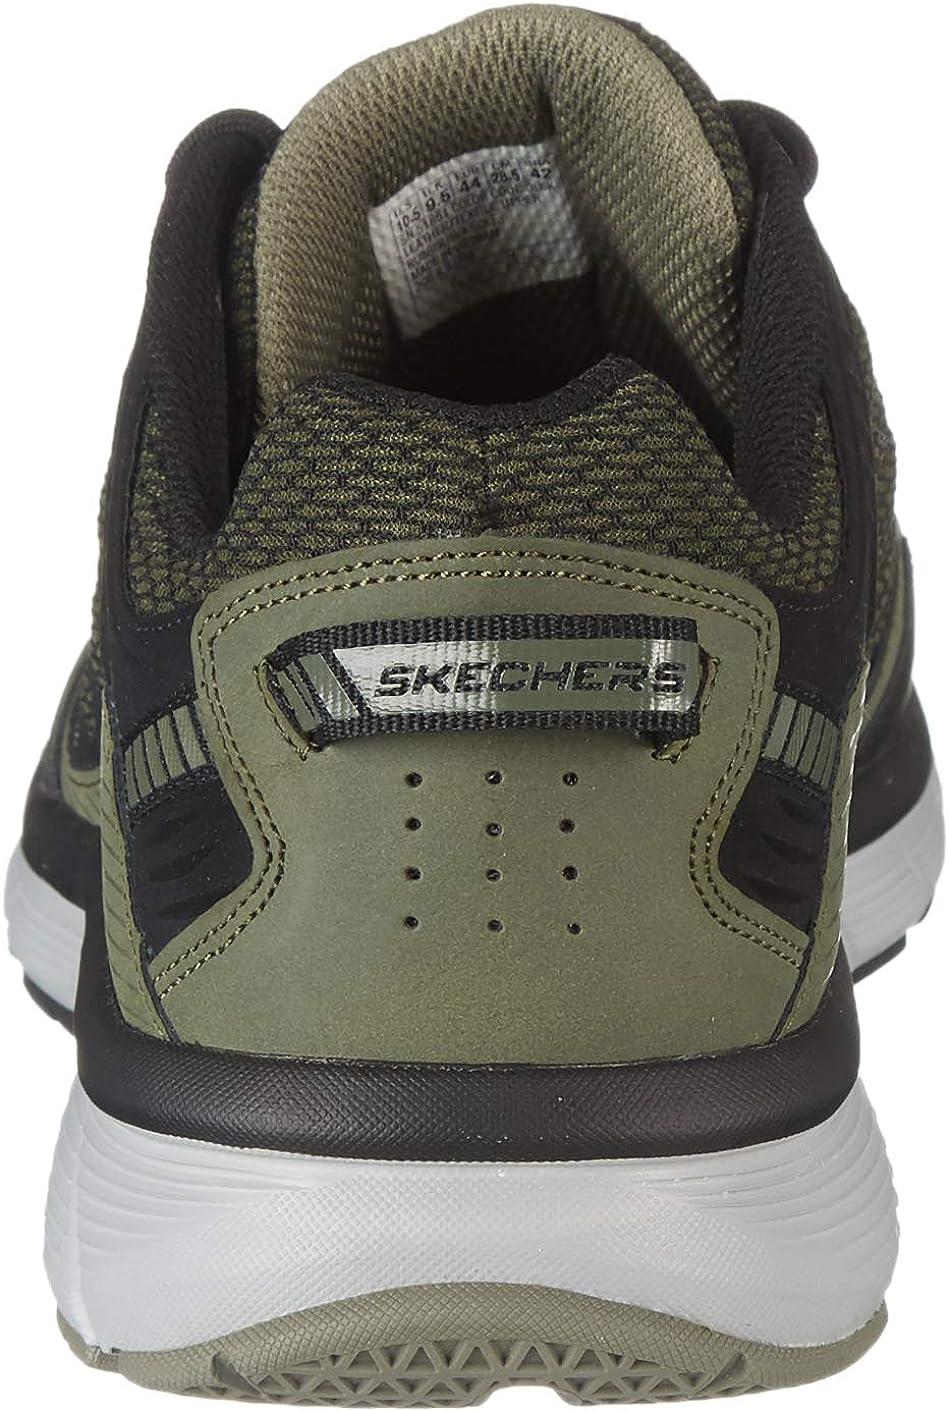 Skechers 51861 Bowerz Sneakers Verde Scuro Olive Black